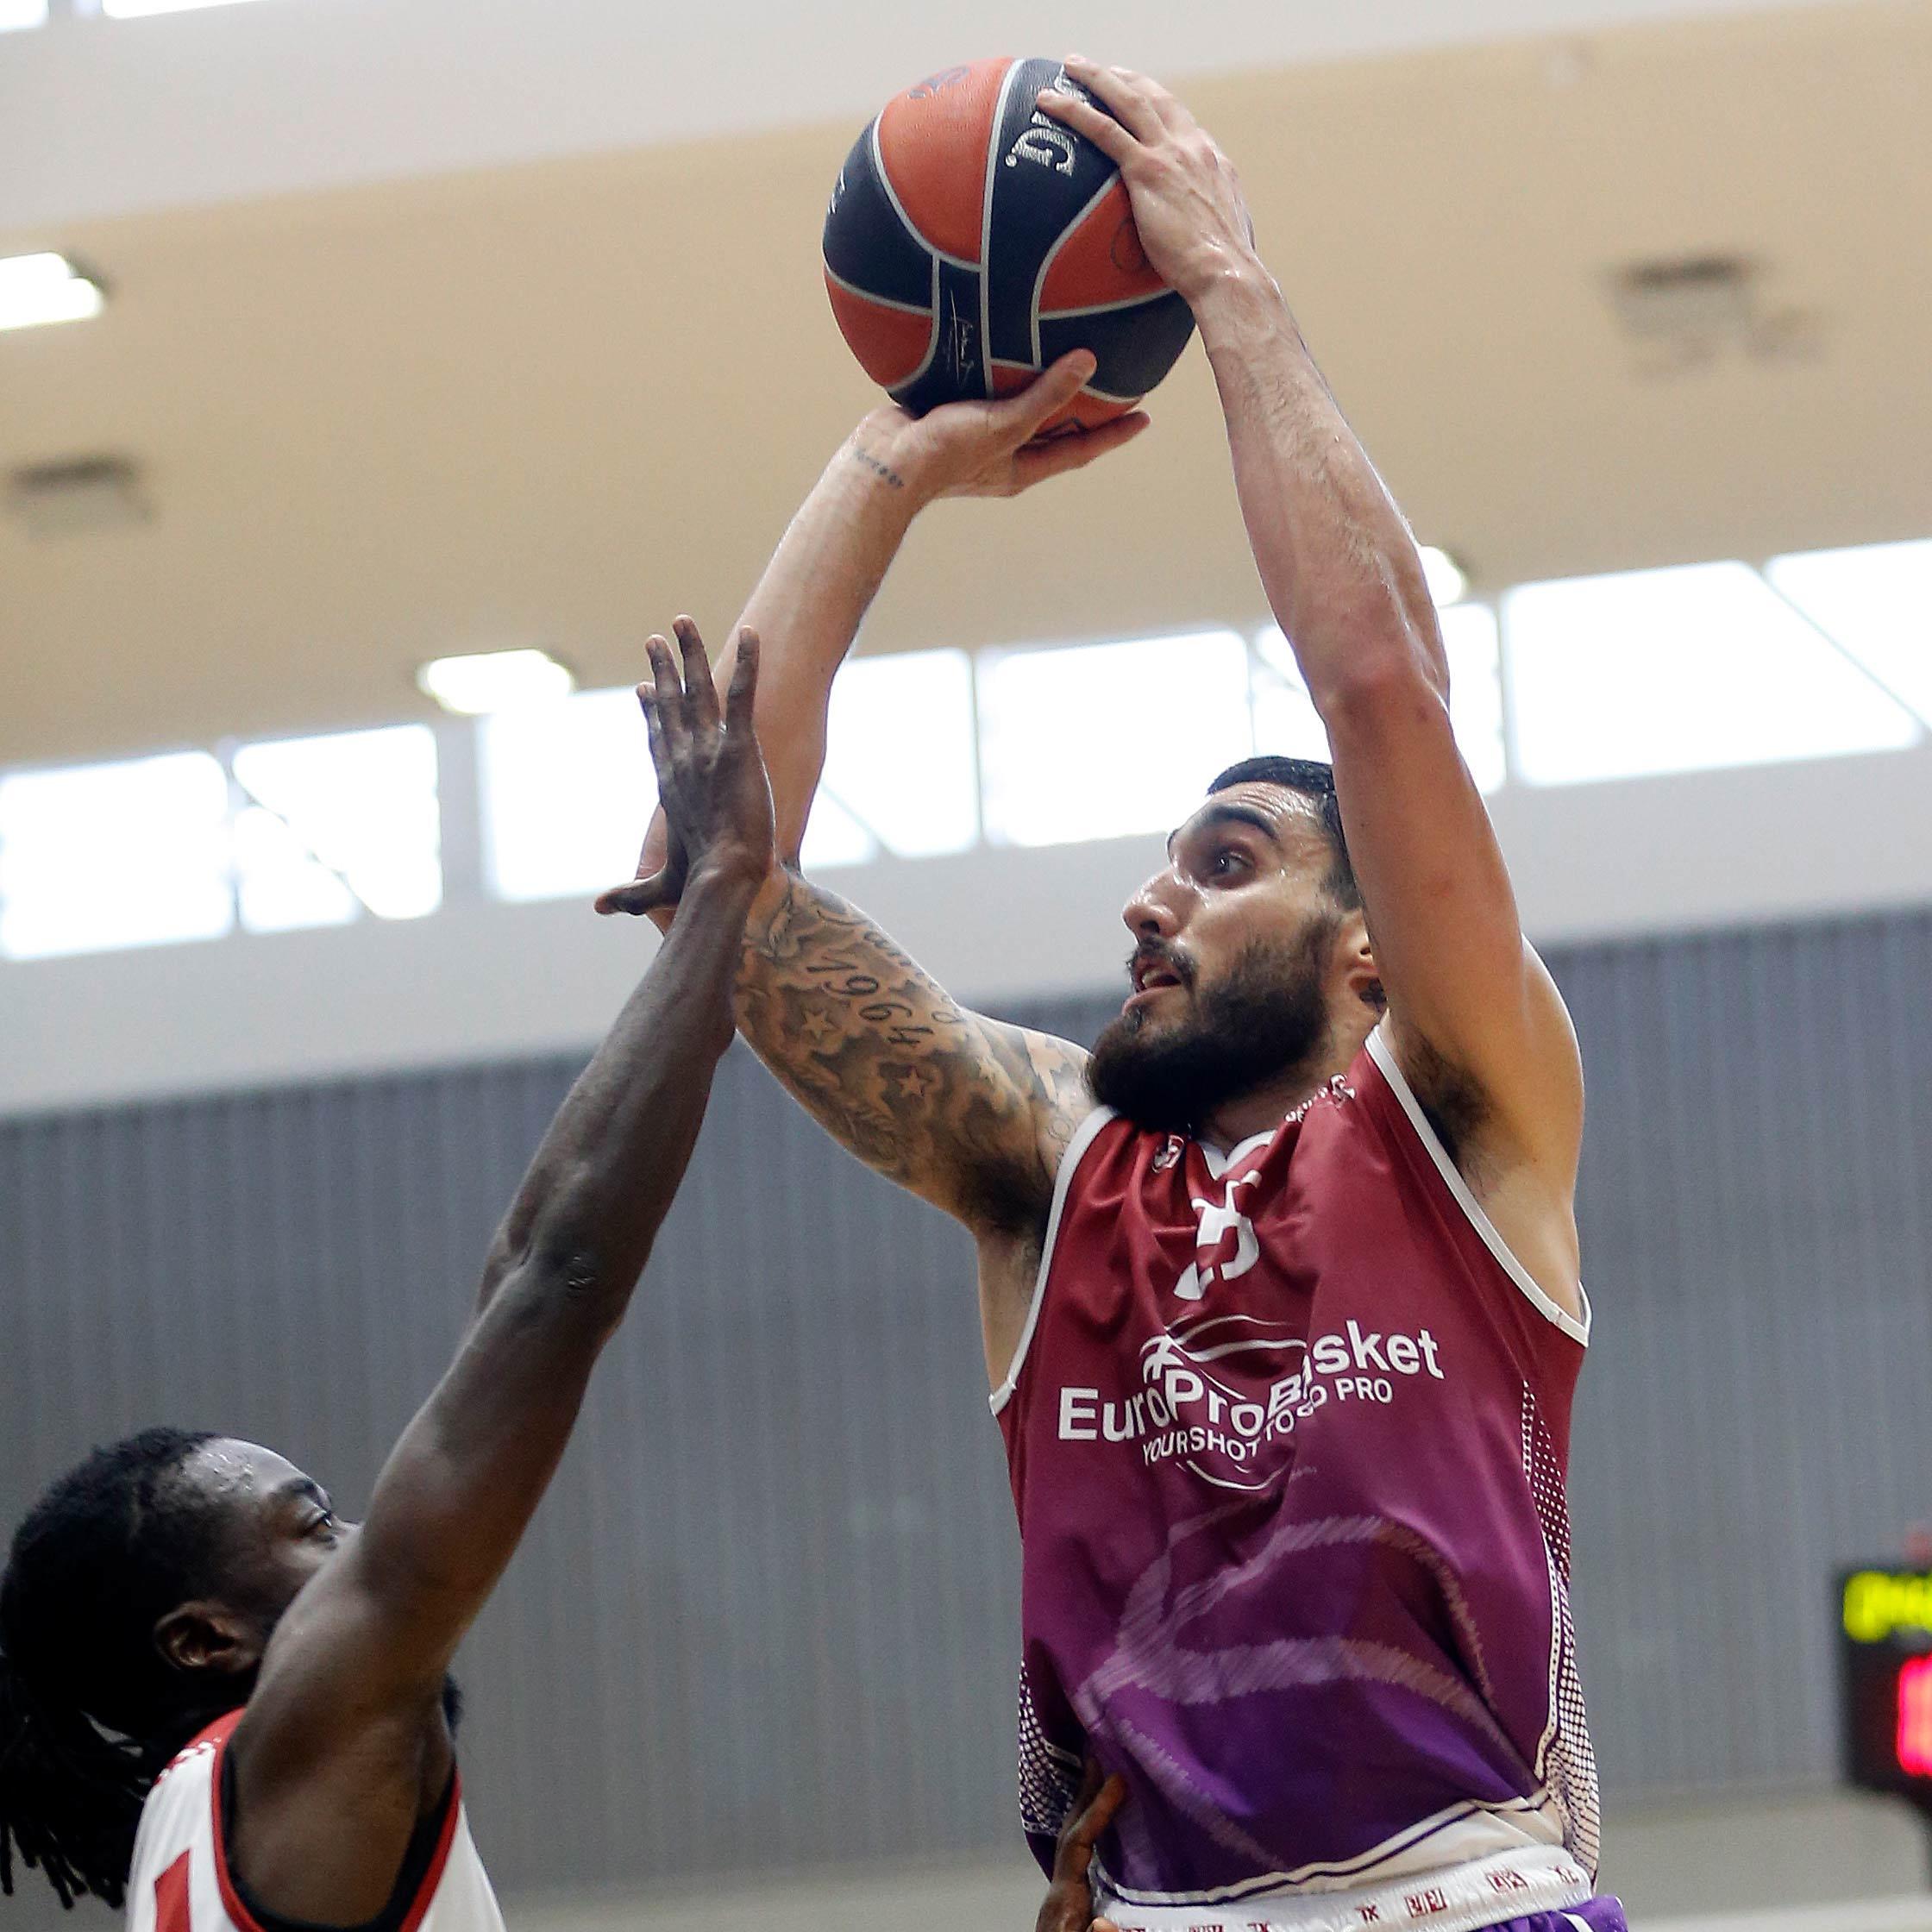 EuroProBasket Jose Ramos